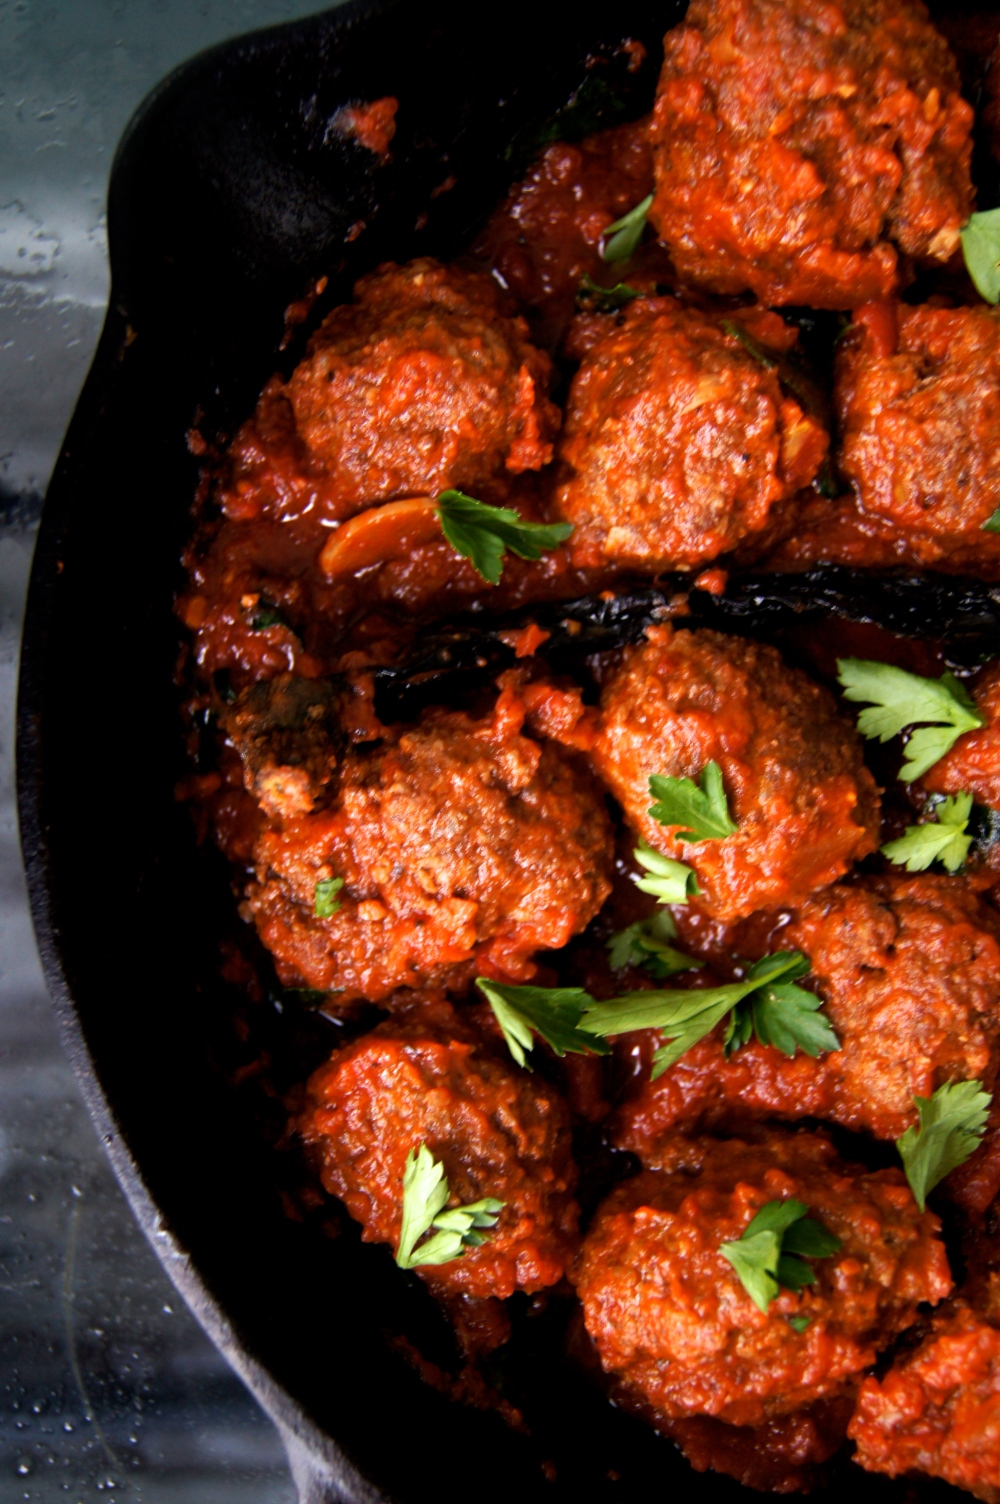 cumin-spiced meatballs